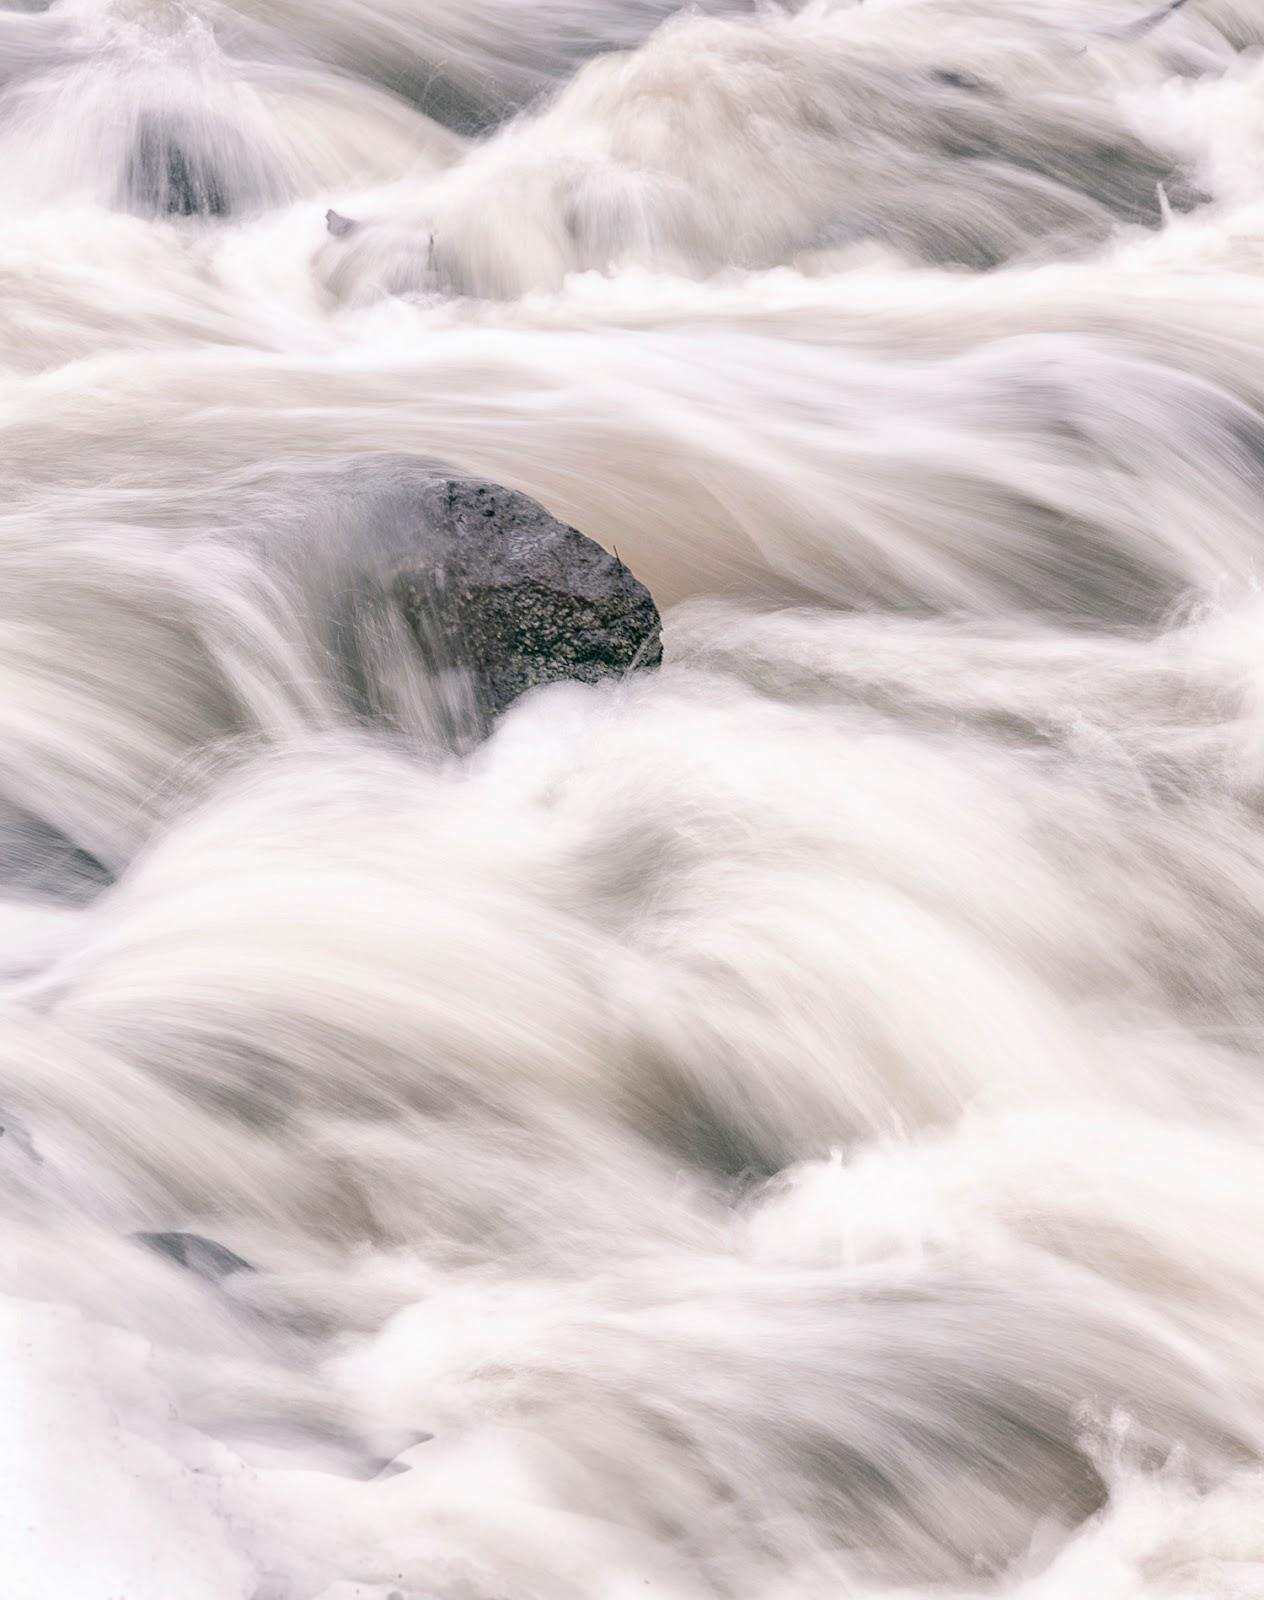 vesi, water, long exposure, pitkä valotusaika, valokuvaus, photography, luontokuva, naturephotography, valokuvaaja, Frida Steiner, Visualaddict, Visualaddictfrida, photographer, luontokuva, puro, koski